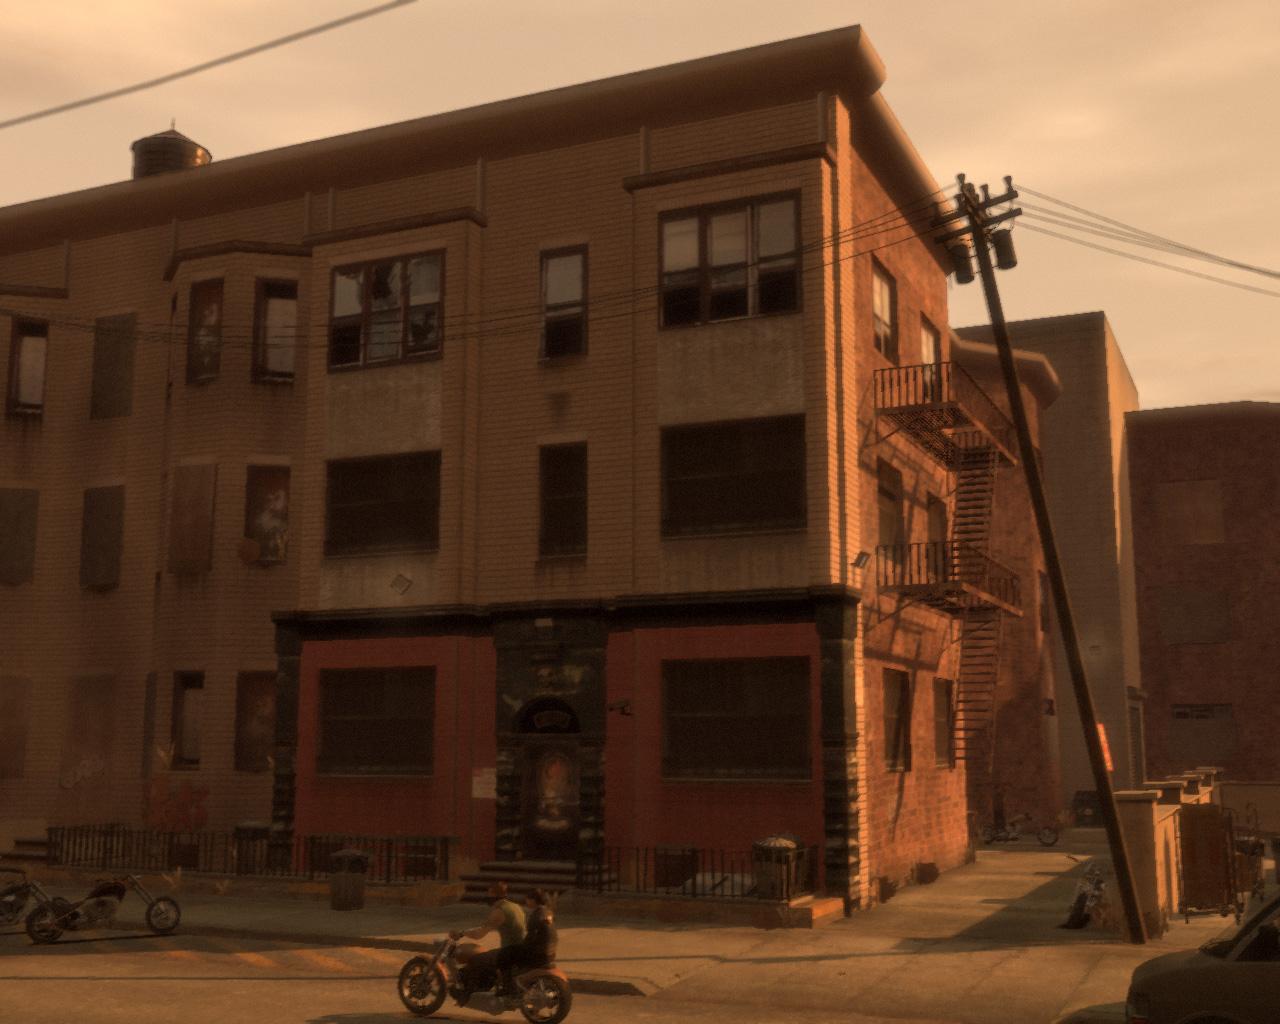 The Lost MC Clubhouse | GTA Wiki | FANDOM powered by Wikia